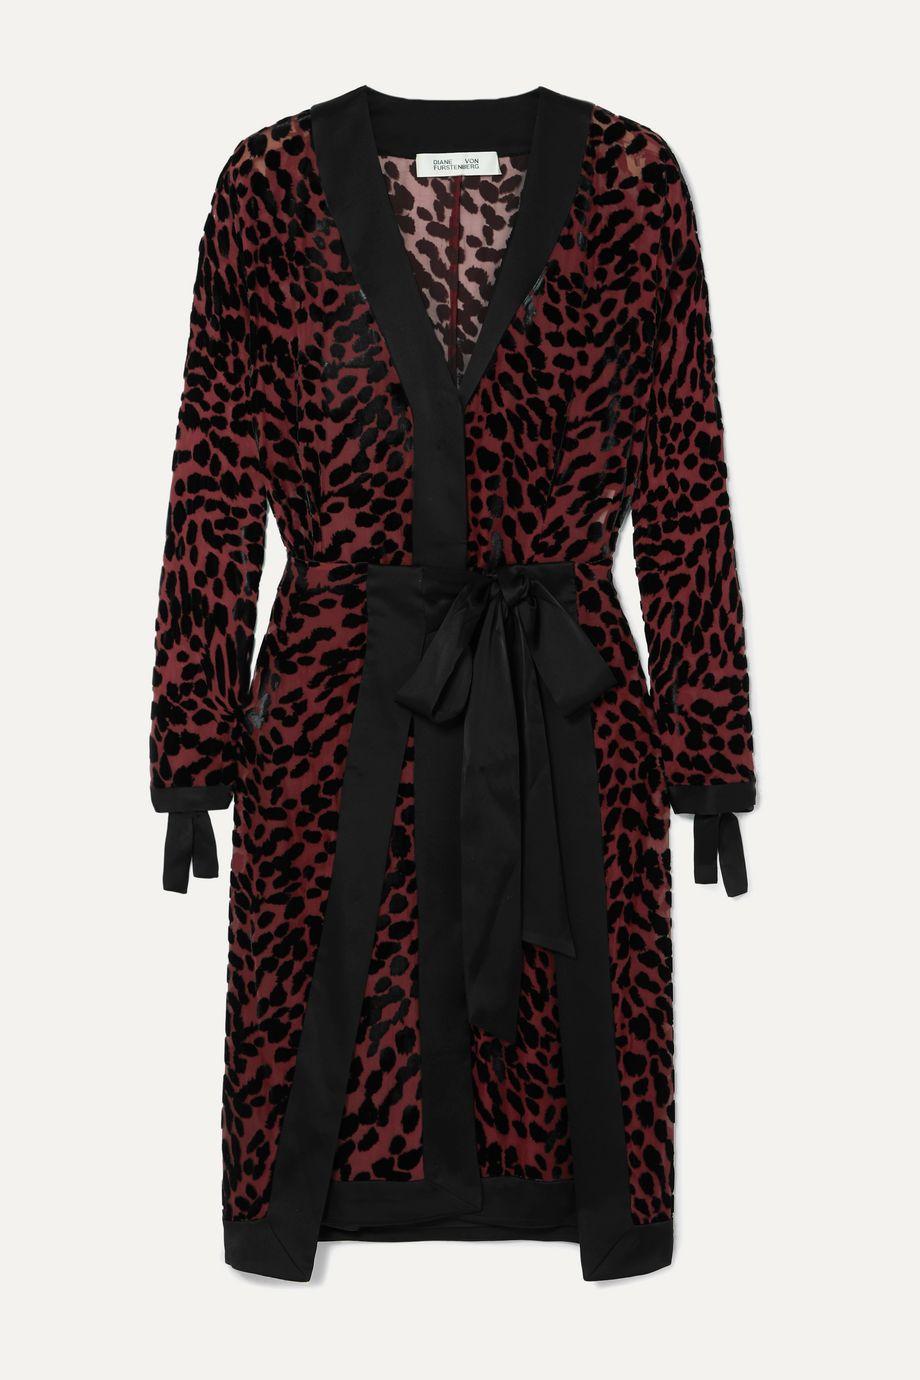 Diane von Furstenberg Pianna satin-trimmed leopard-print devoré-chiffon wrap dress